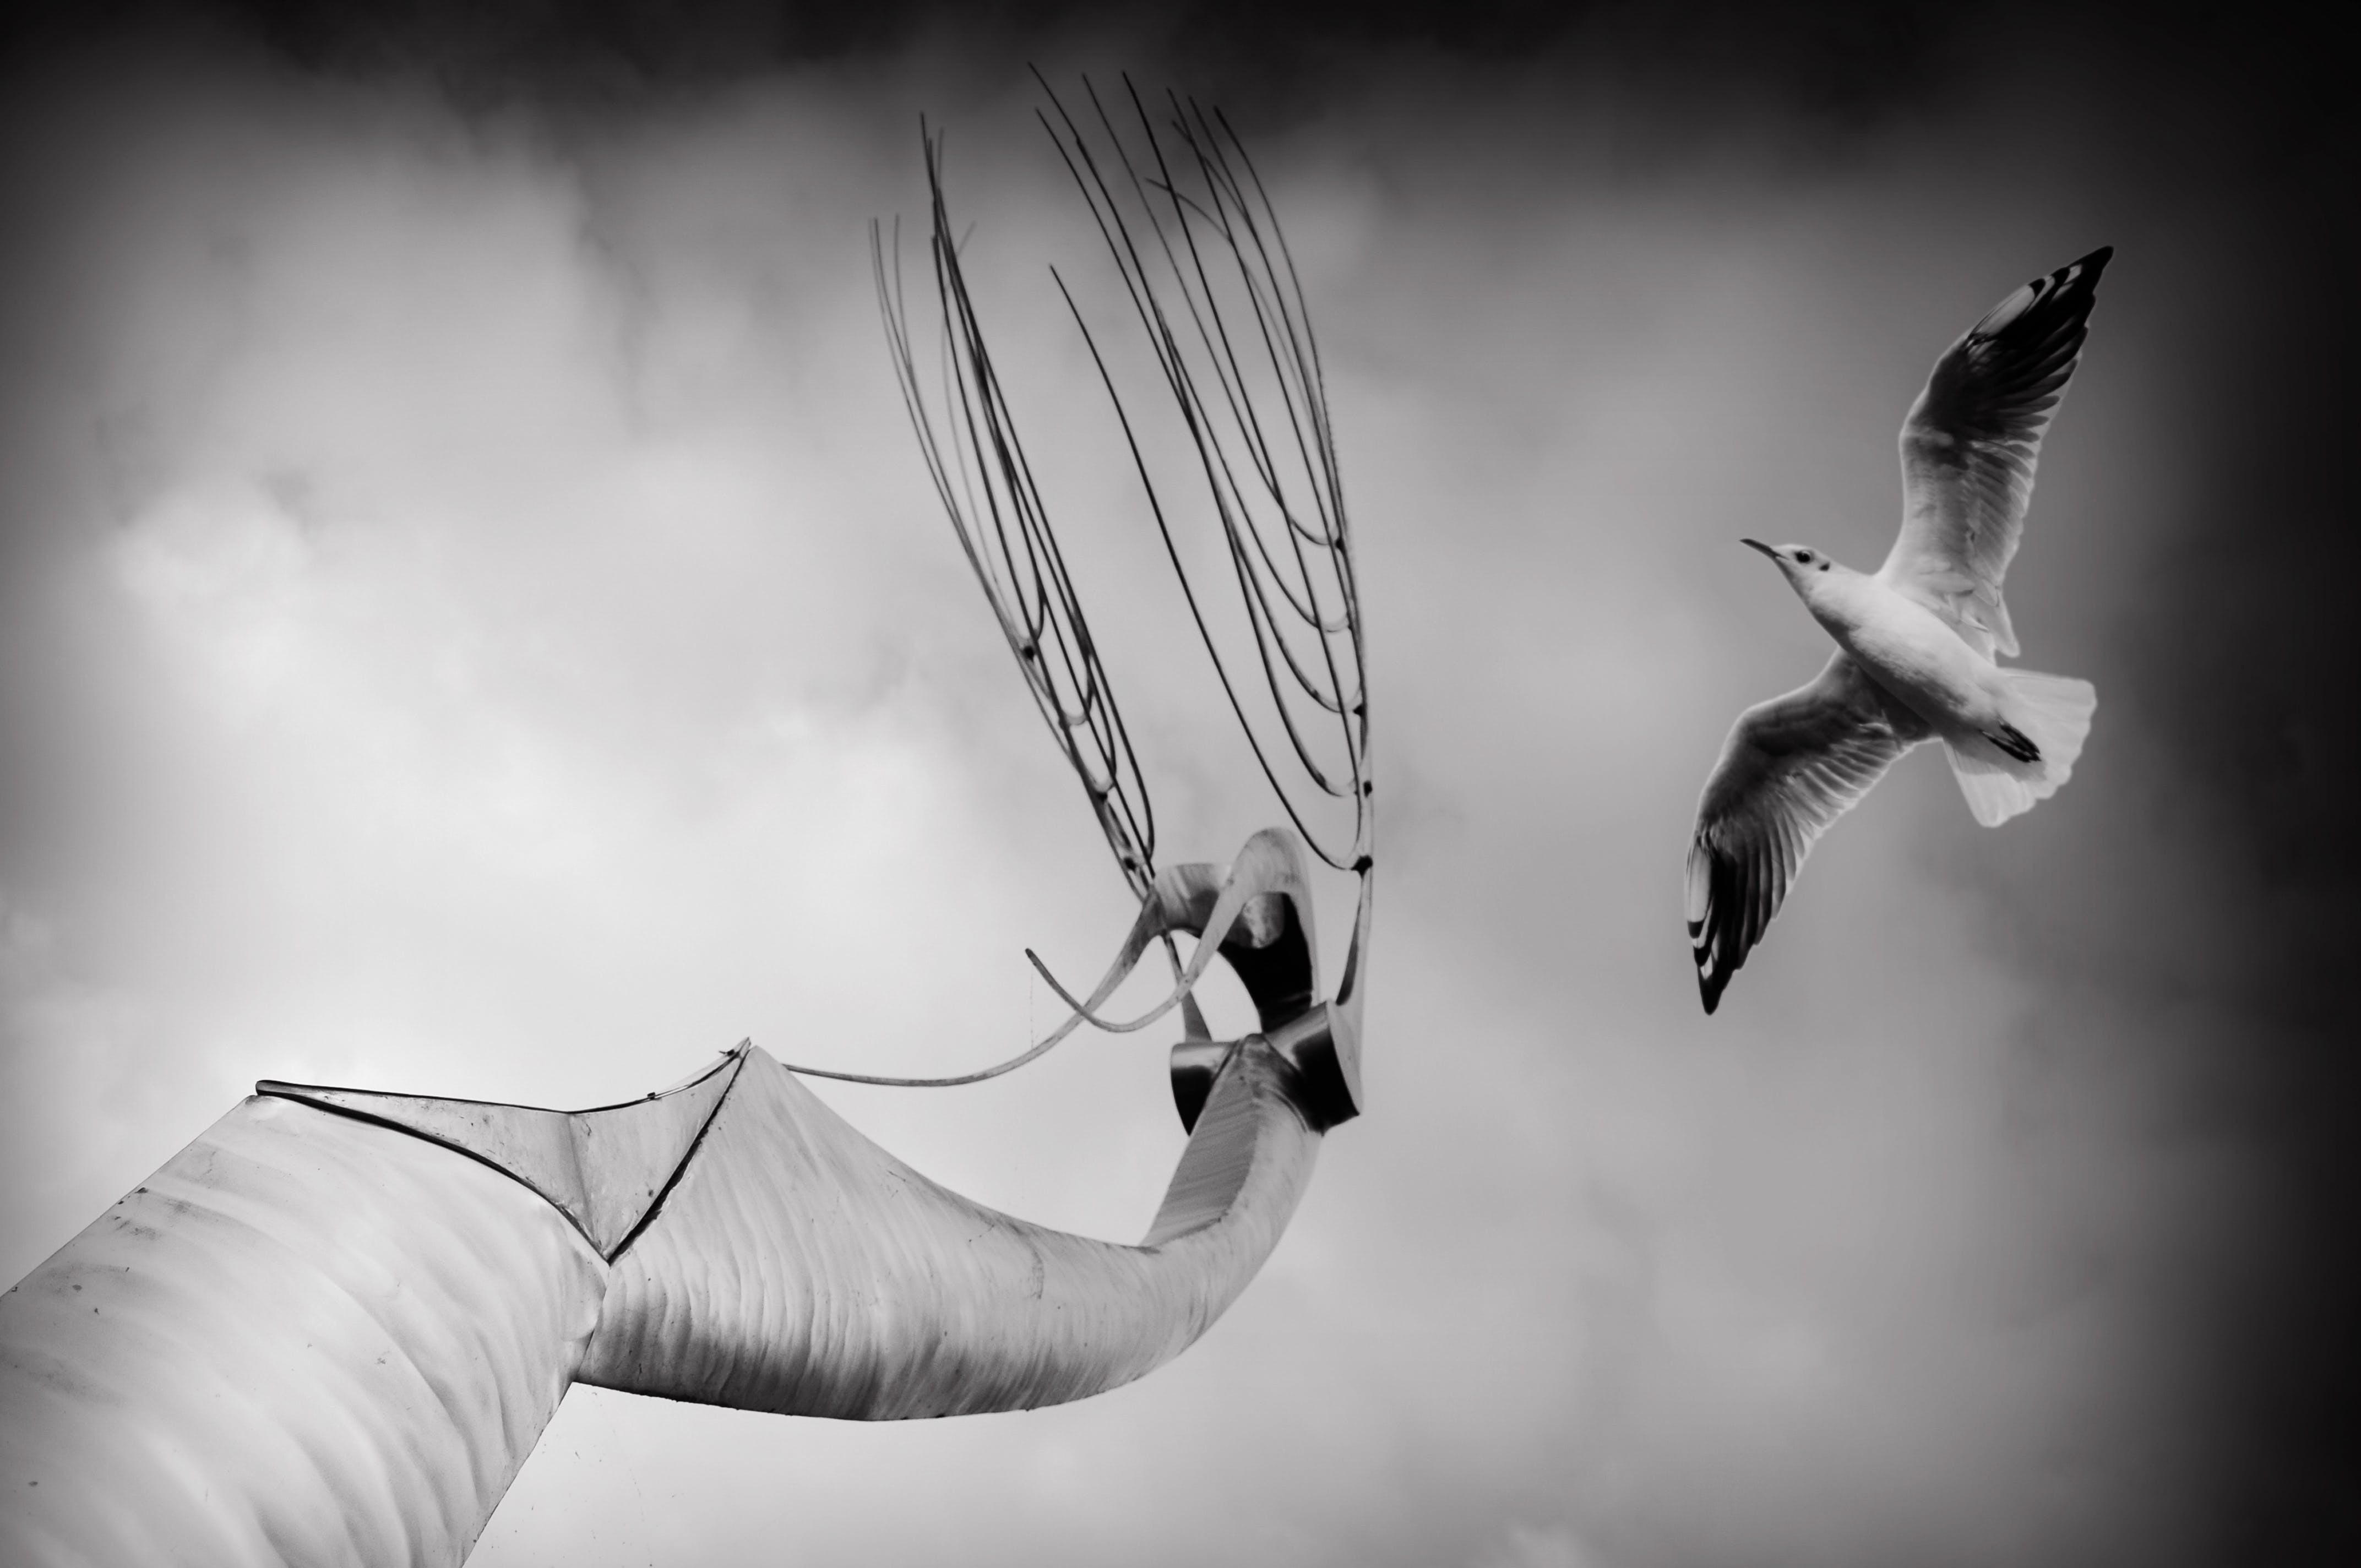 Free stock photo of sky, bird, flying, art